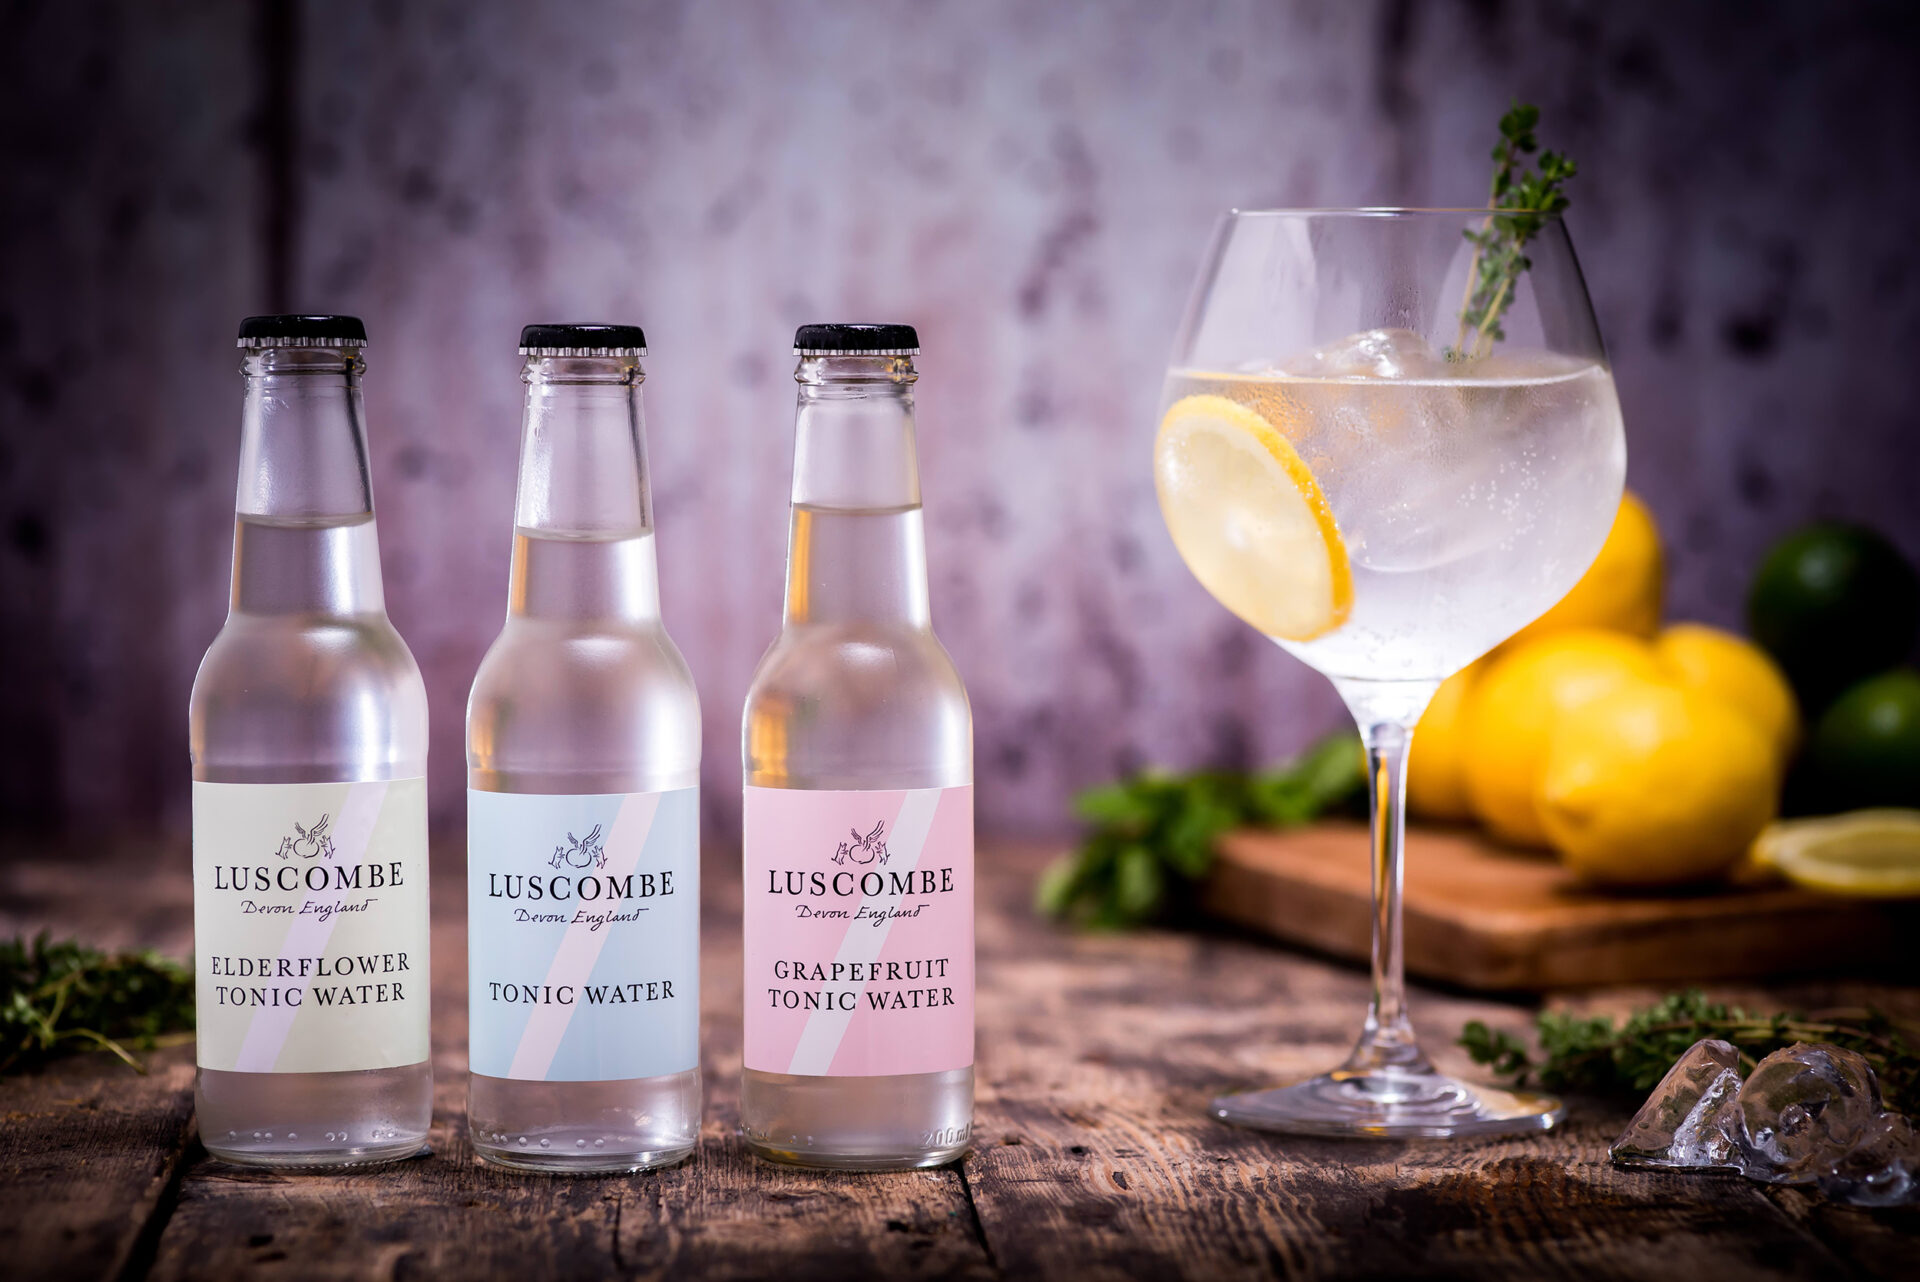 bens-farm-shop-june-blog-luscombes-tonic-water